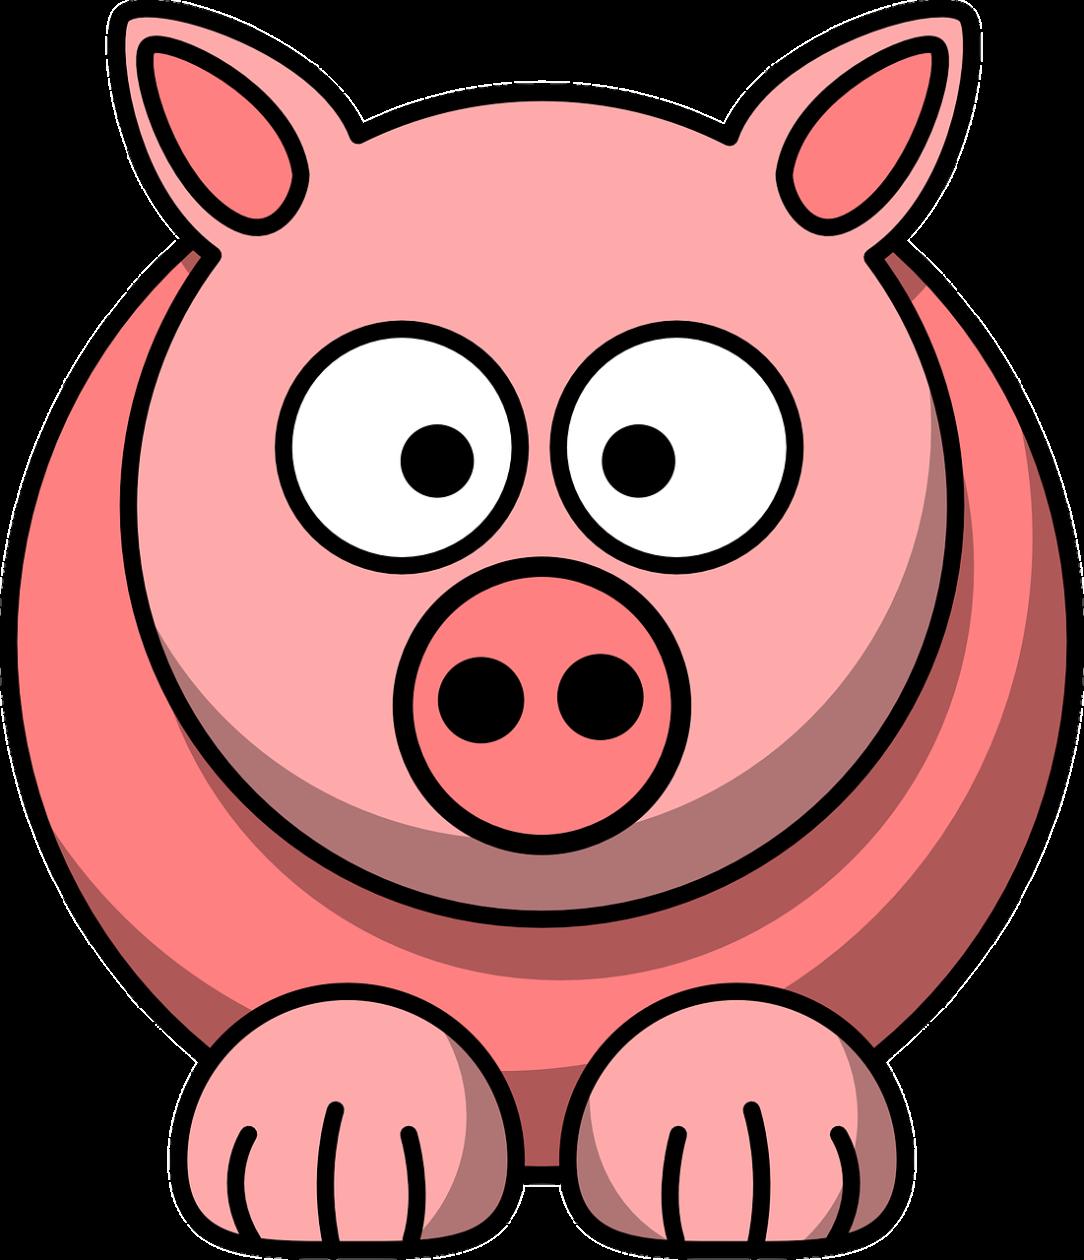 1084x1260 Pig Math For Love